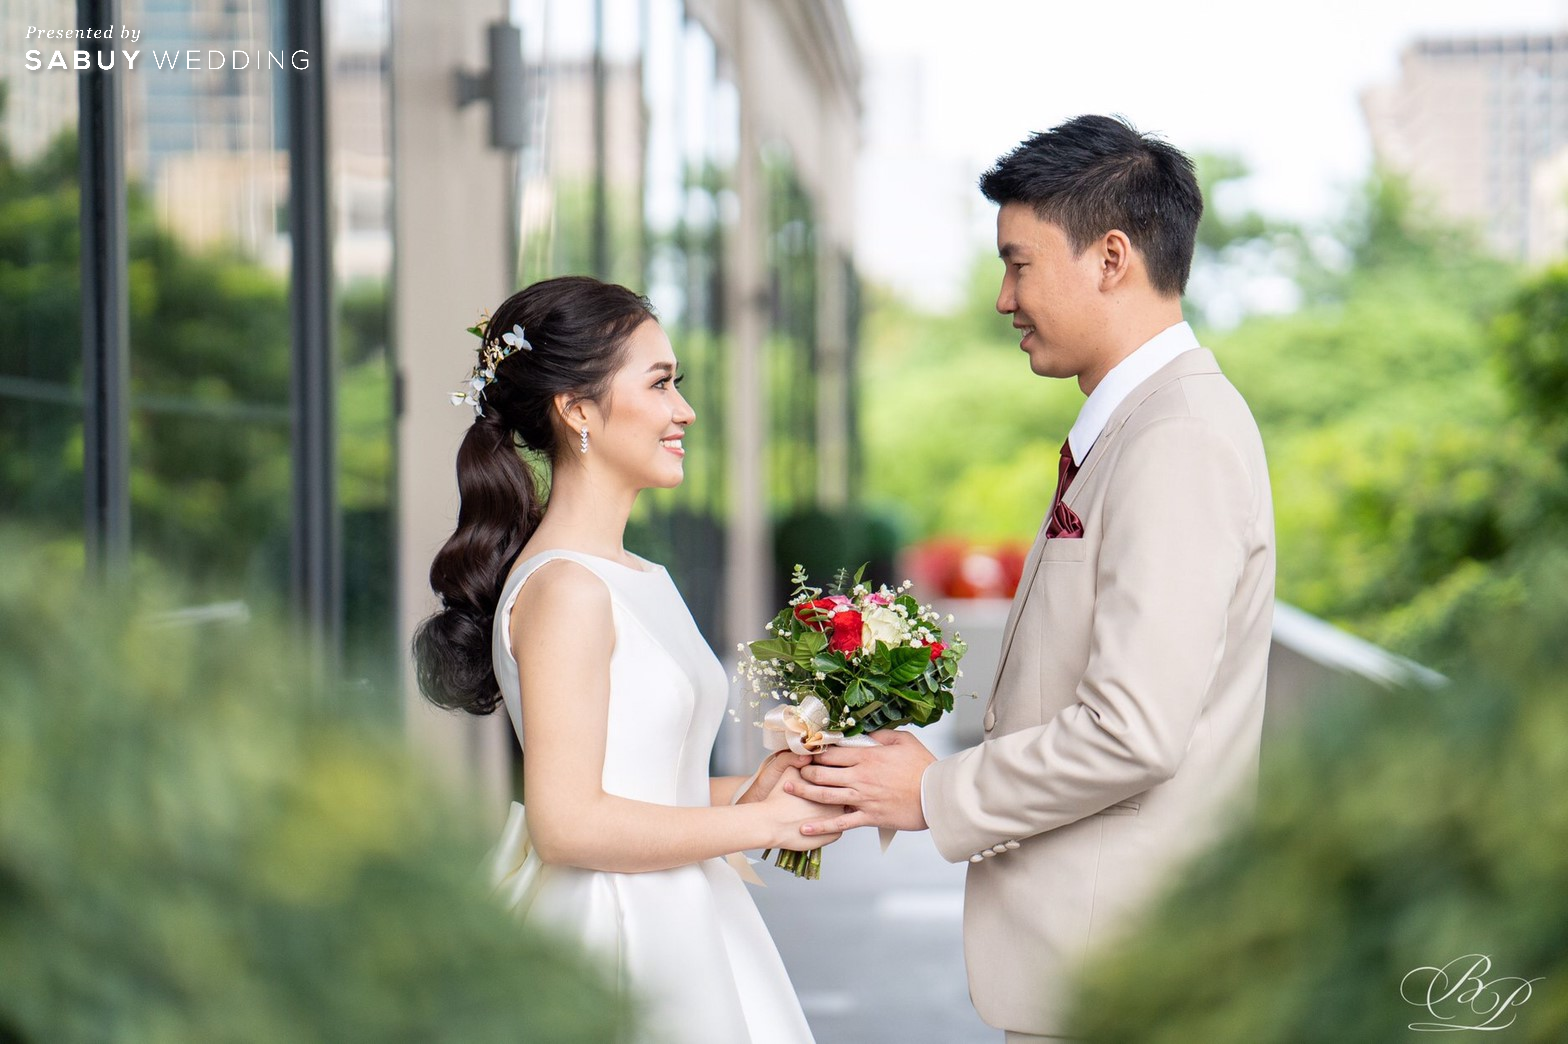 Bliston,สถานที่แต่งงาน,โรงแรม,เจ้าบ่าว,เจ้าสาว รีวิวงานแต่ง Backdrop สวนสวย ด้วยห้องจัดเลี้ยงแสงธรรมชาติ @ Bliston Suwan Park View Hotel